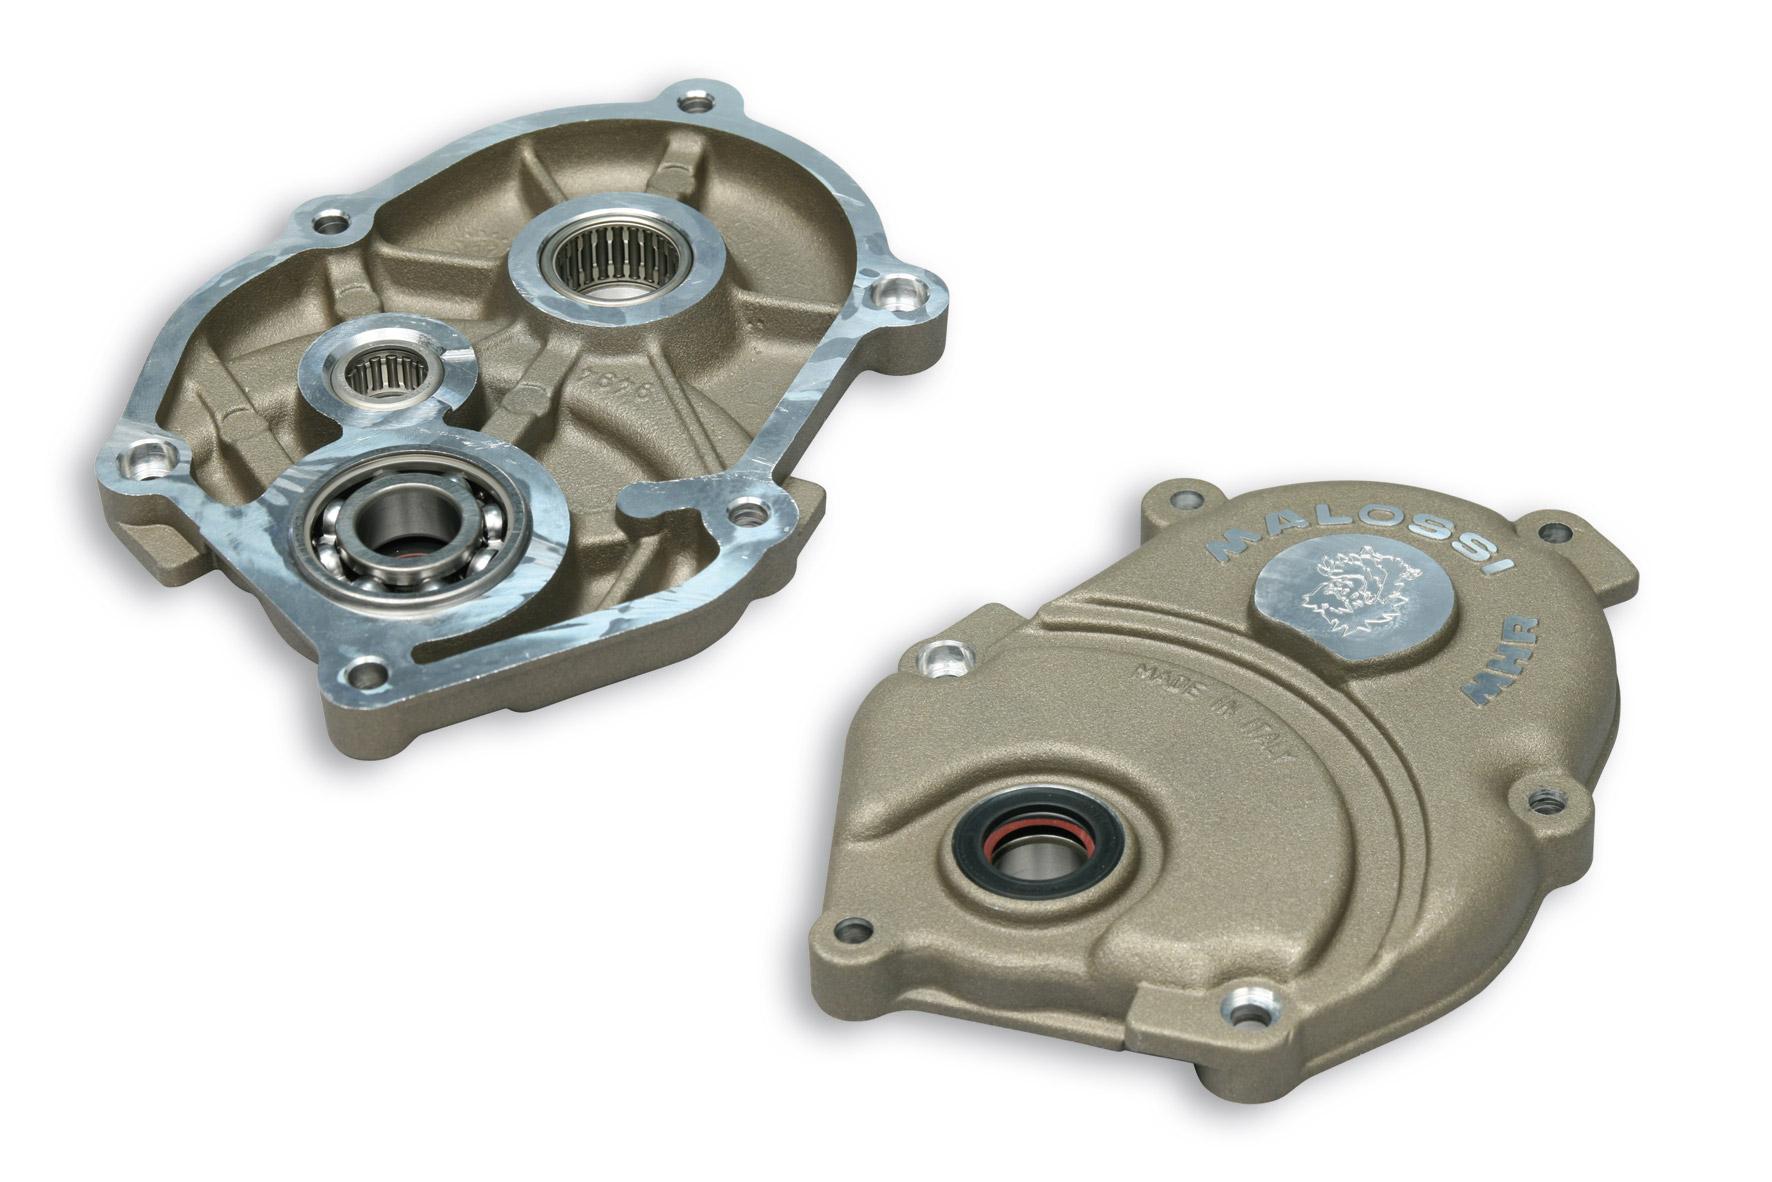 Carter ingranaggi ROLLER CRANKCASE MHR per motori Yamaha - Minarelli